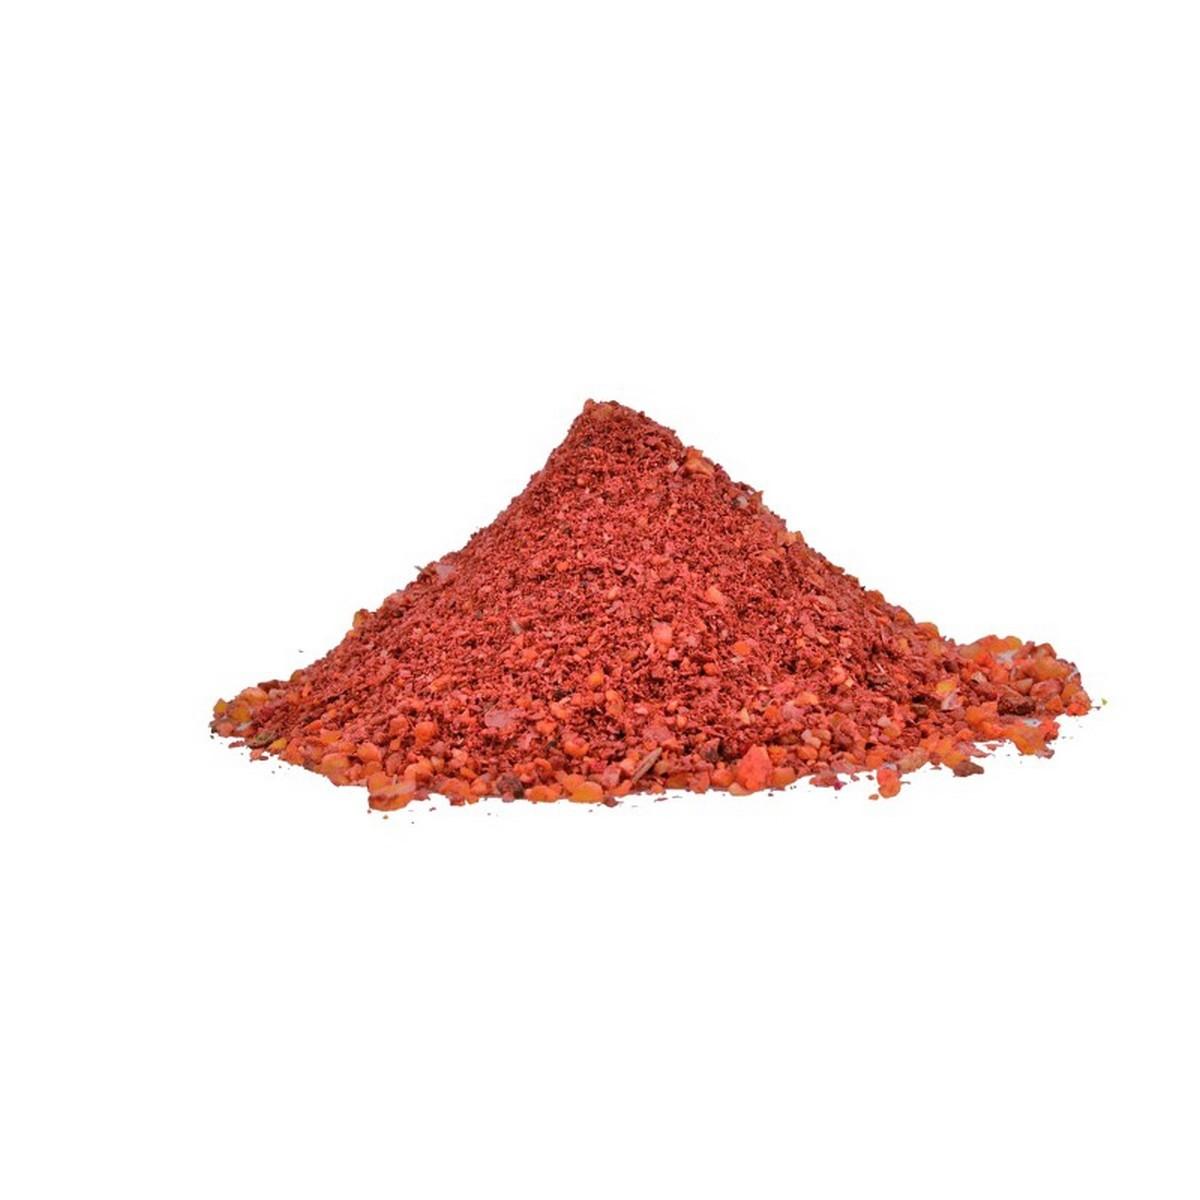 Захранка CZ Feeder Zoom Groundbait Chili-Pepper-Garlic